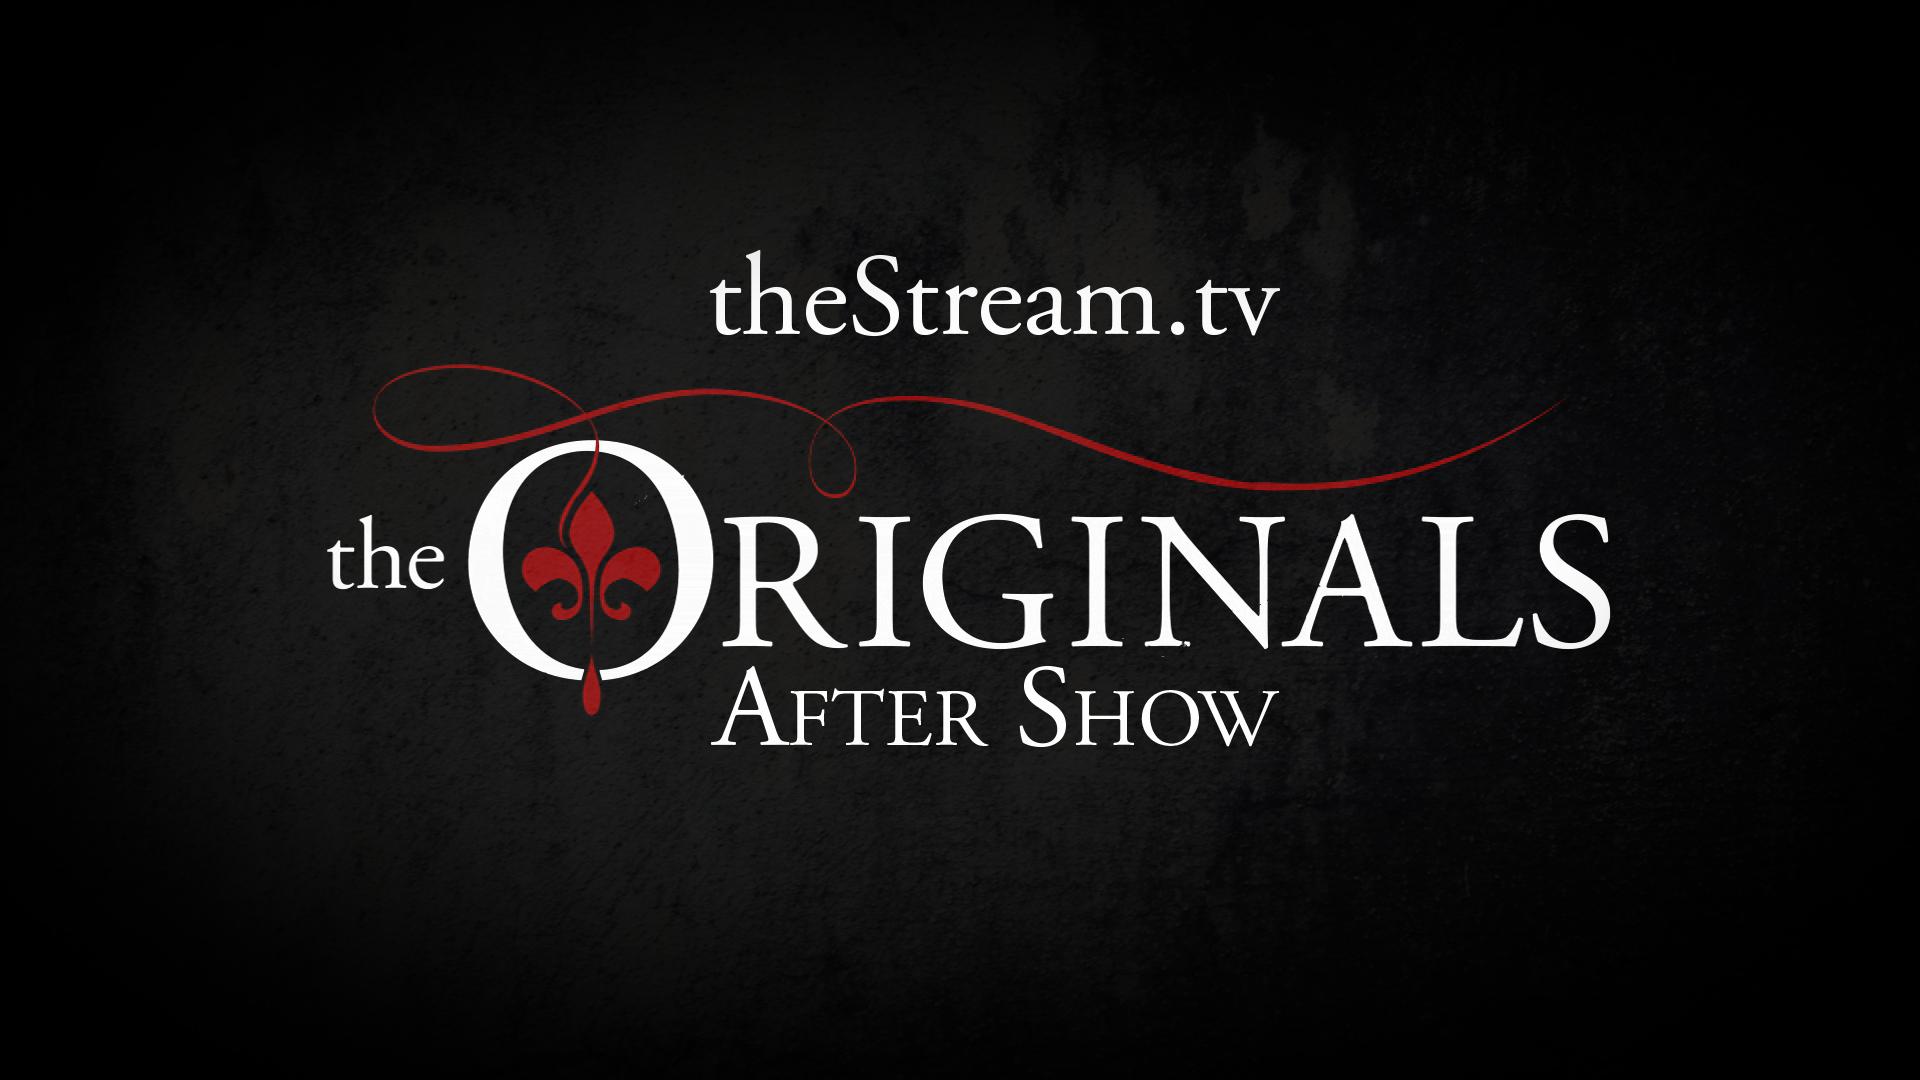 The Originals After Show